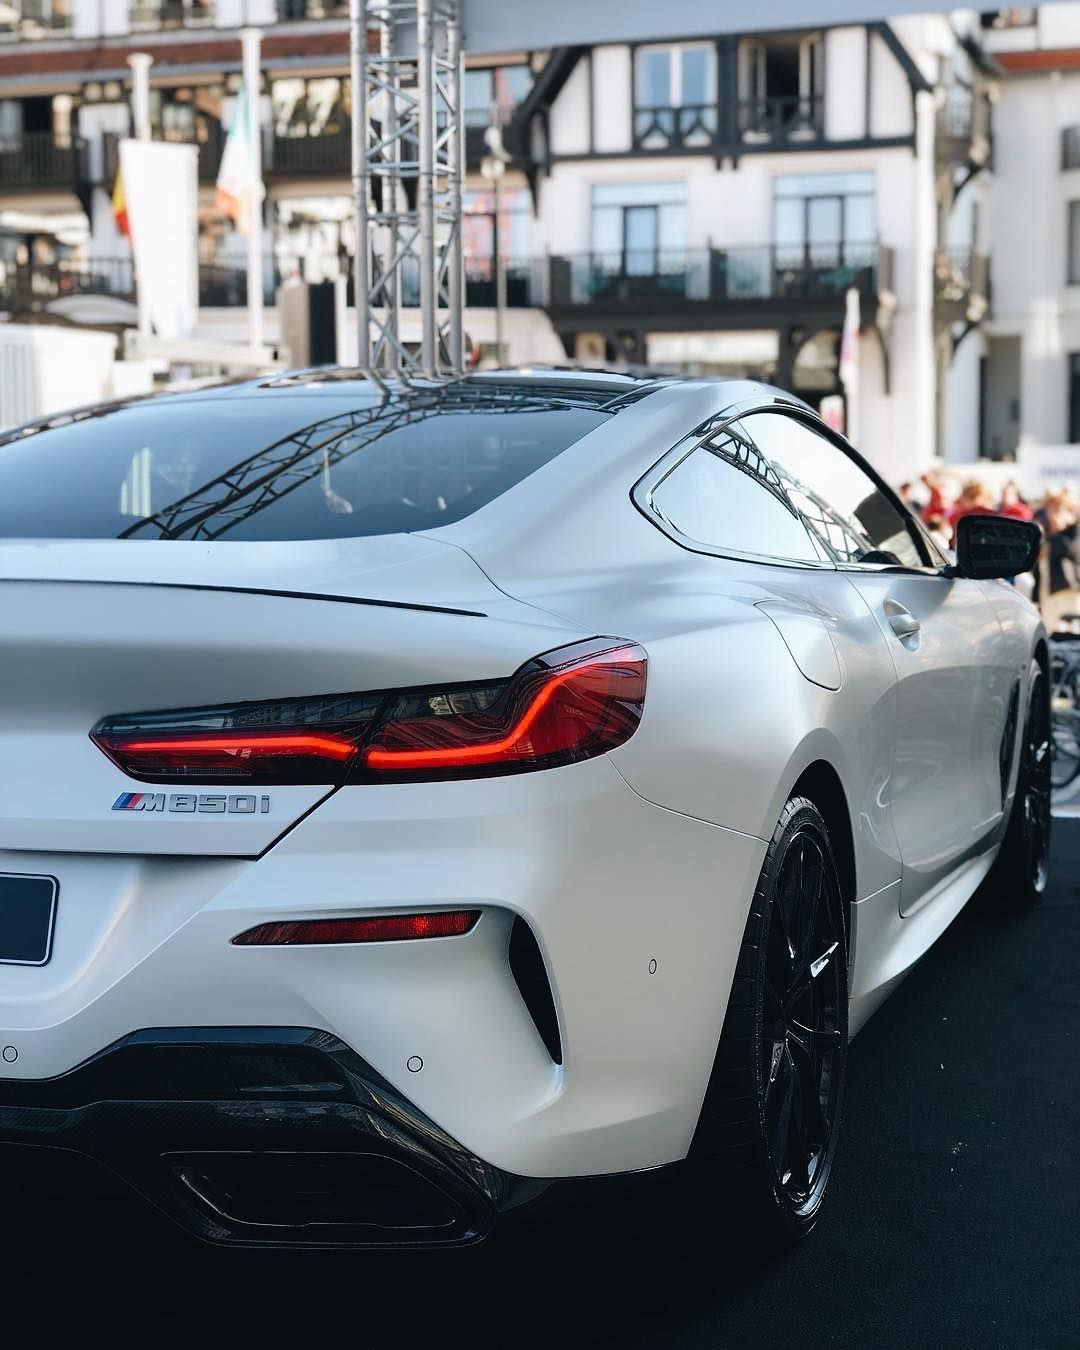 Satin White Bmw M850i What Do You Guys Think Carlifestyle Photo By F X Tih Dream Cars Bmw Bmw Lamborghini Cars